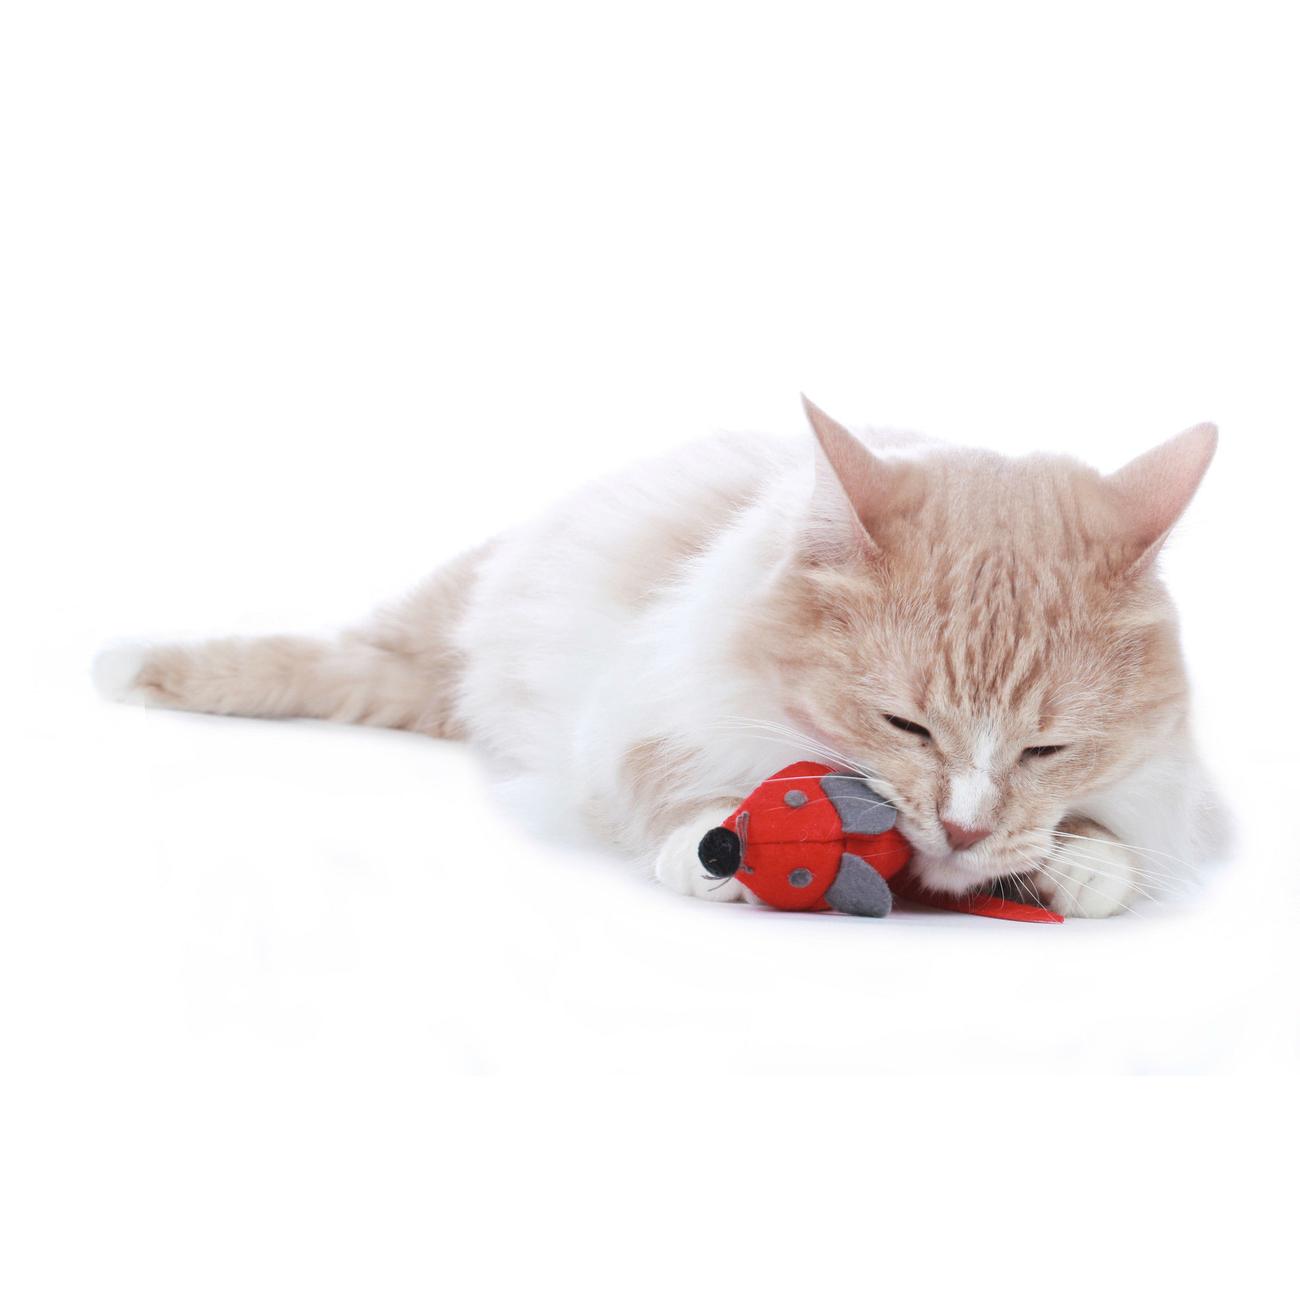 Hunter Katzenspielzeug by Laura 65902, Bild 12